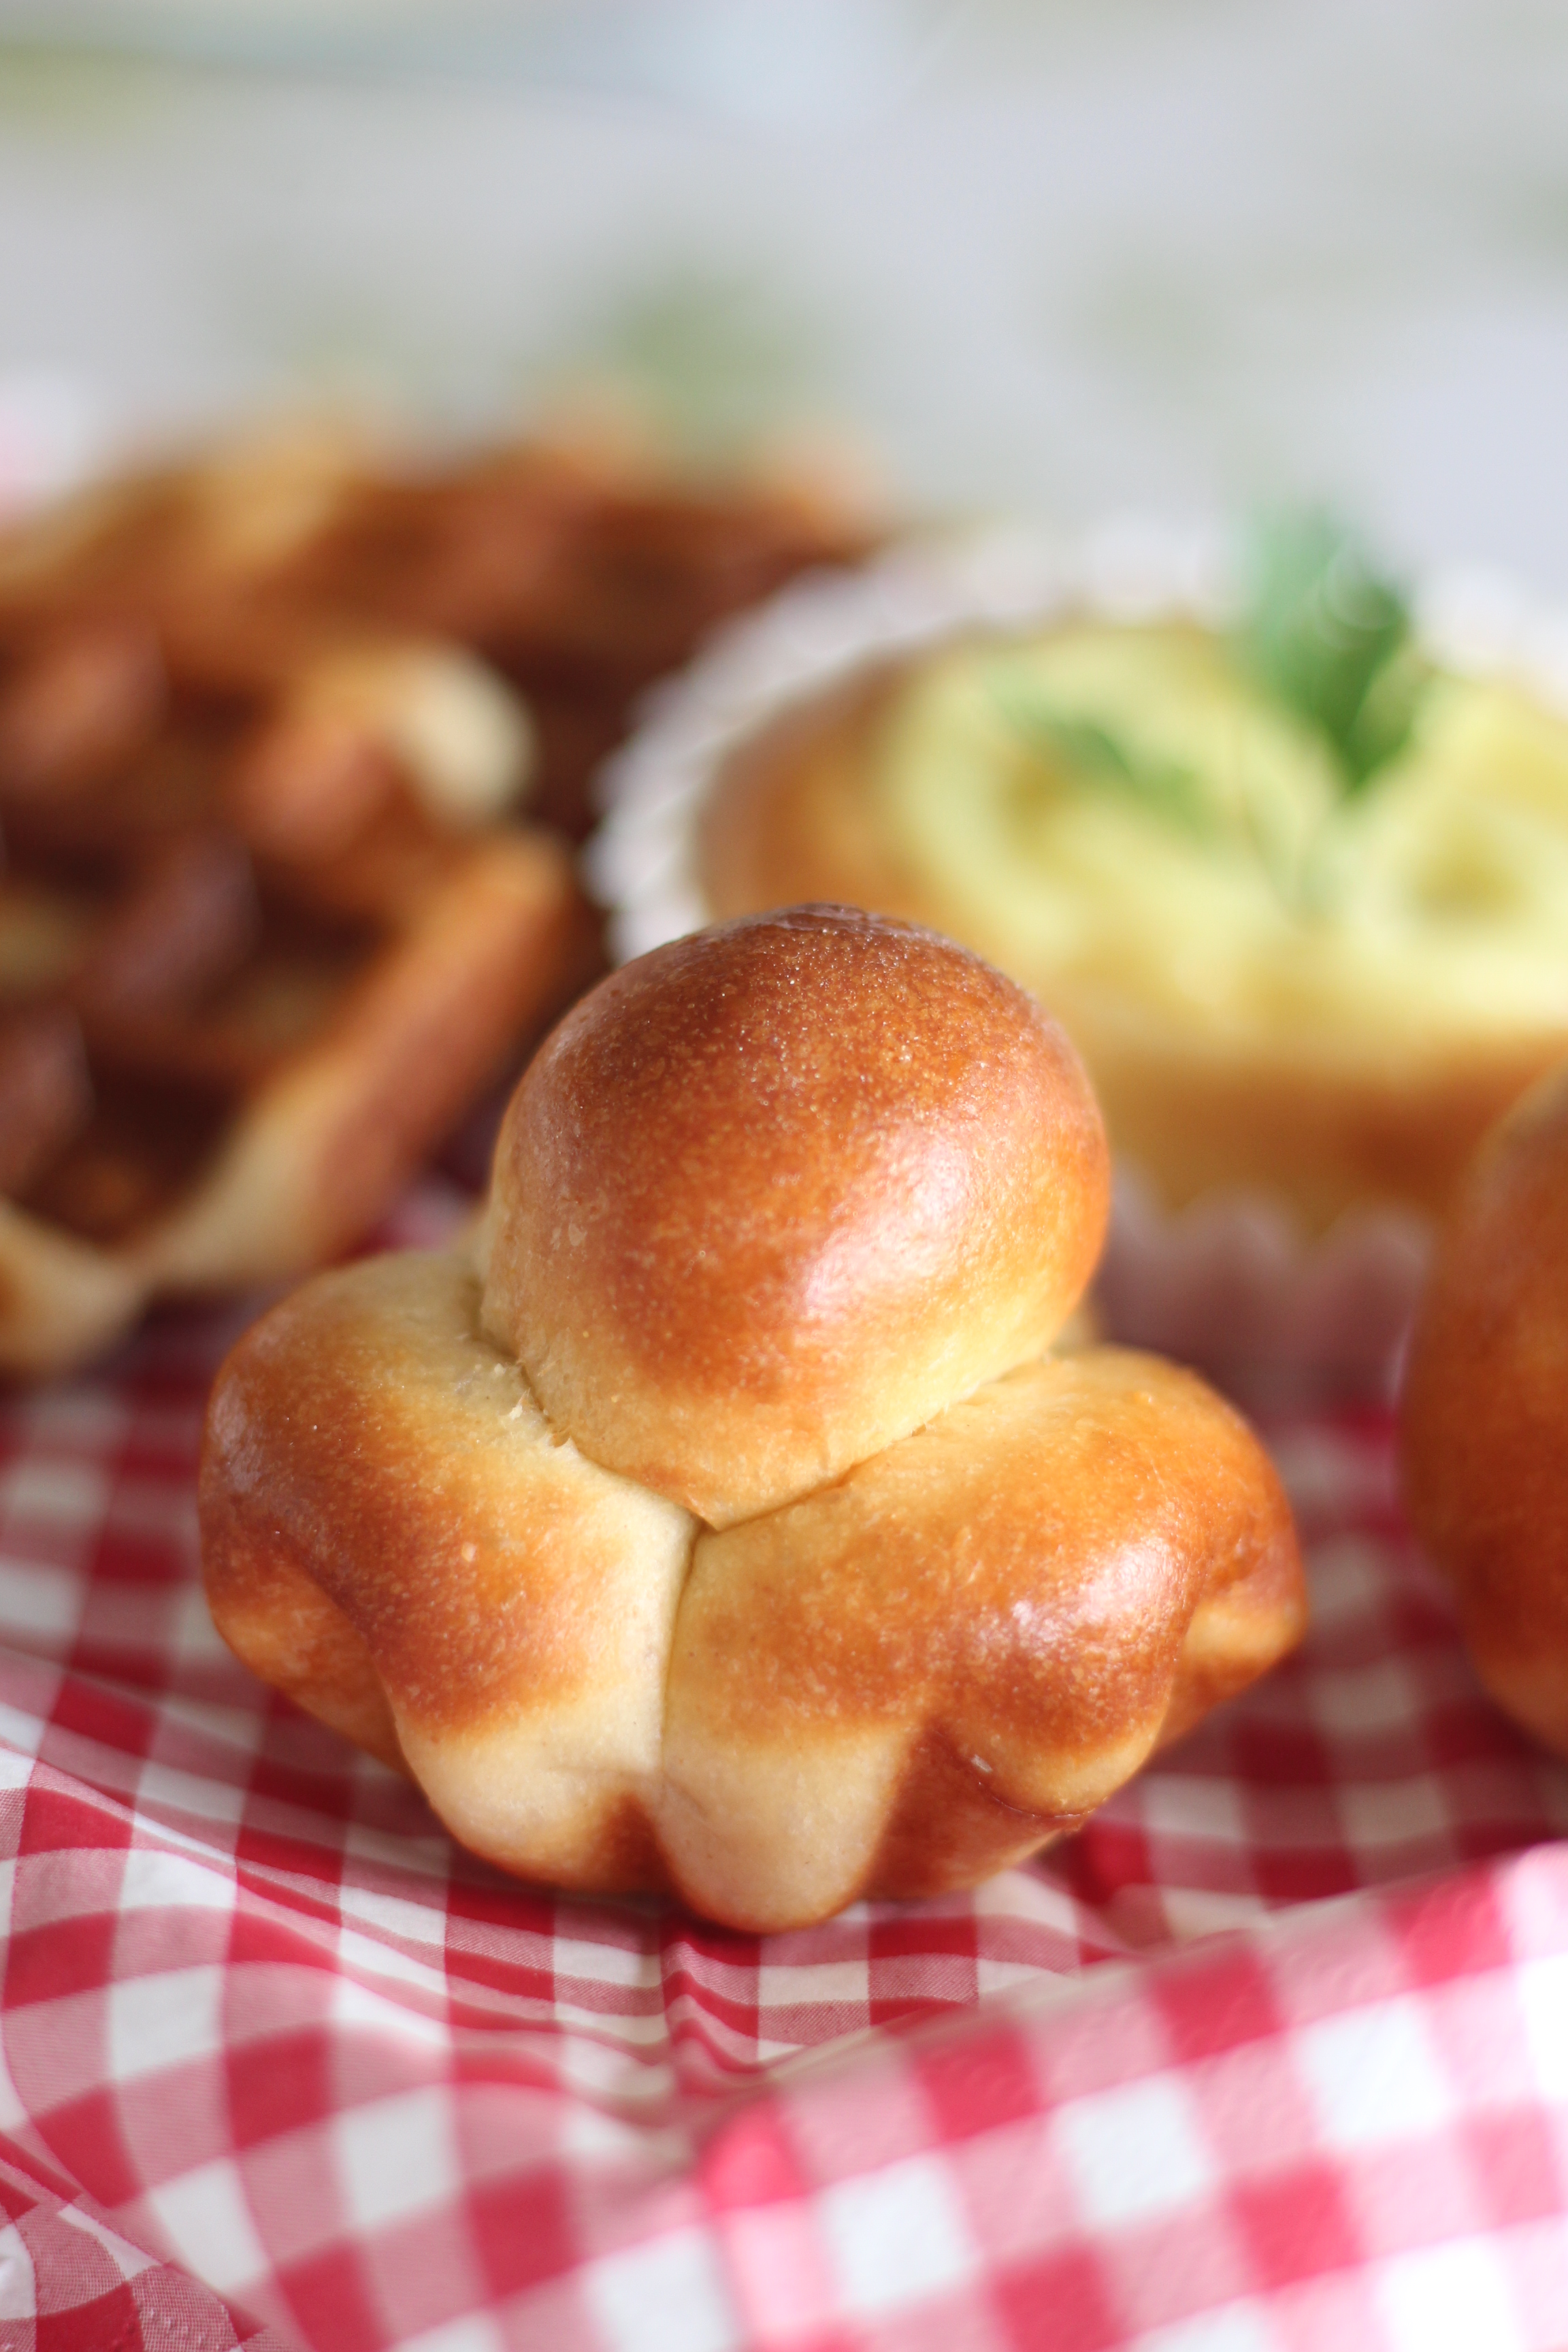 a-ta-sante糖質制限パン料理教室、阿倍野区西田辺。江部粉でブリォッシュ、ワッフル、フロマージュブラン試作。